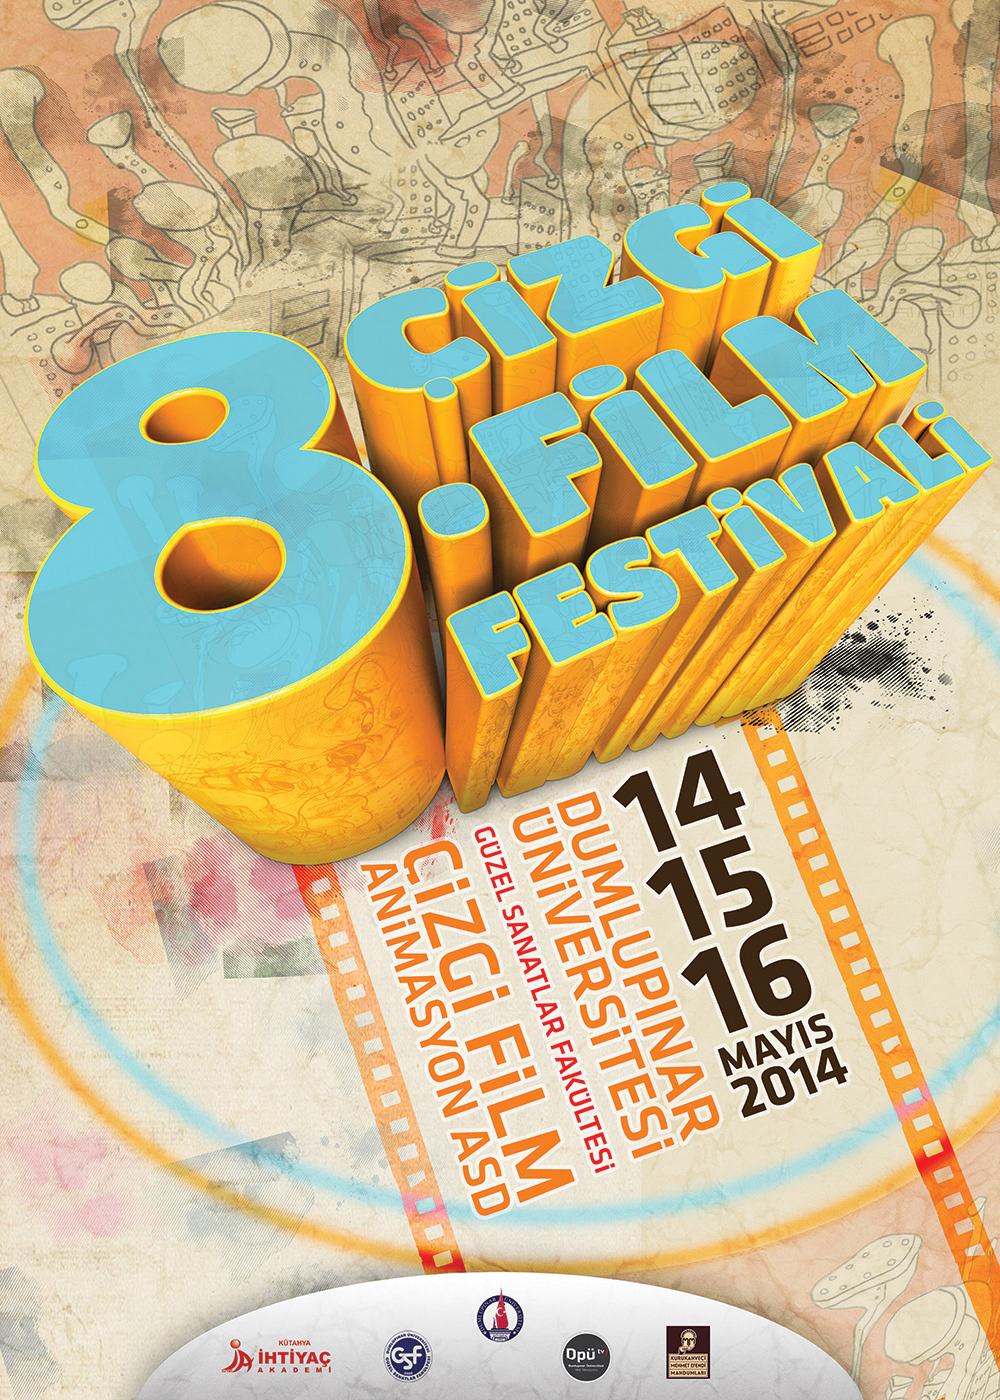 Animation Festival festival Cartoon Festival Website çizgi film hasan calp dumlupınar DPU dpü gsf brand logo 3d logo